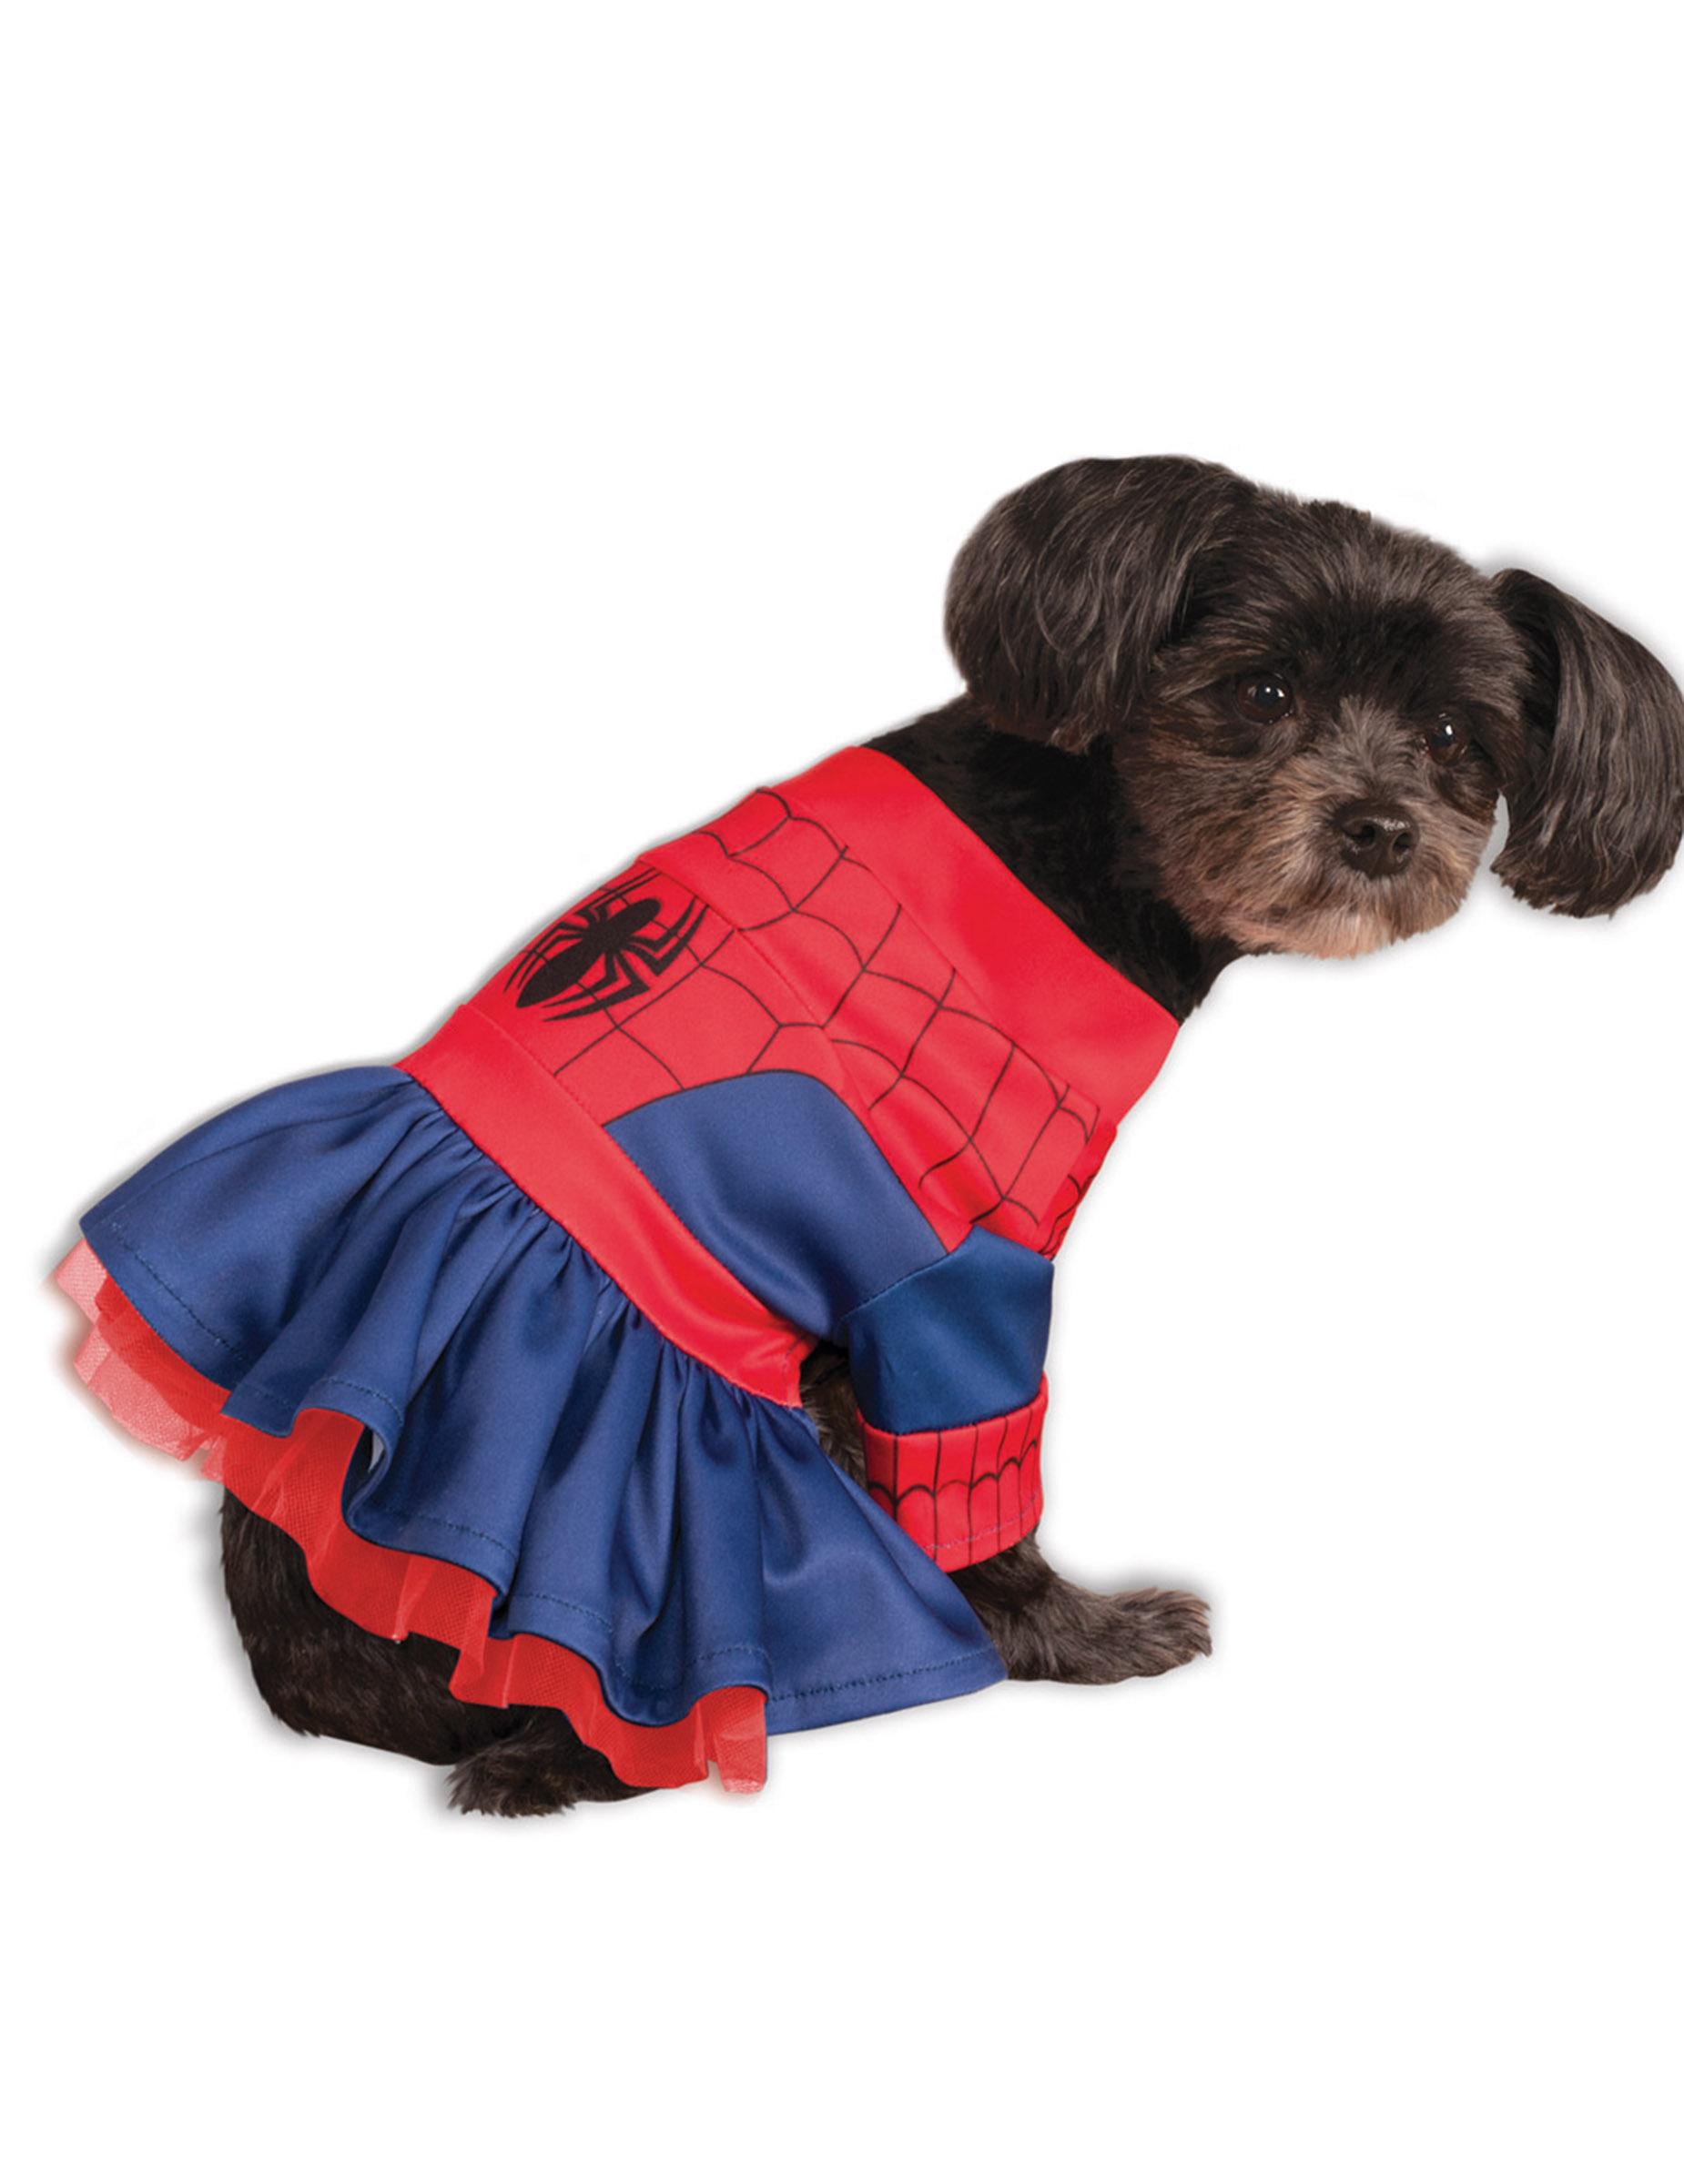 marvel spidergirl hundekost m lizenzware rot blau. Black Bedroom Furniture Sets. Home Design Ideas